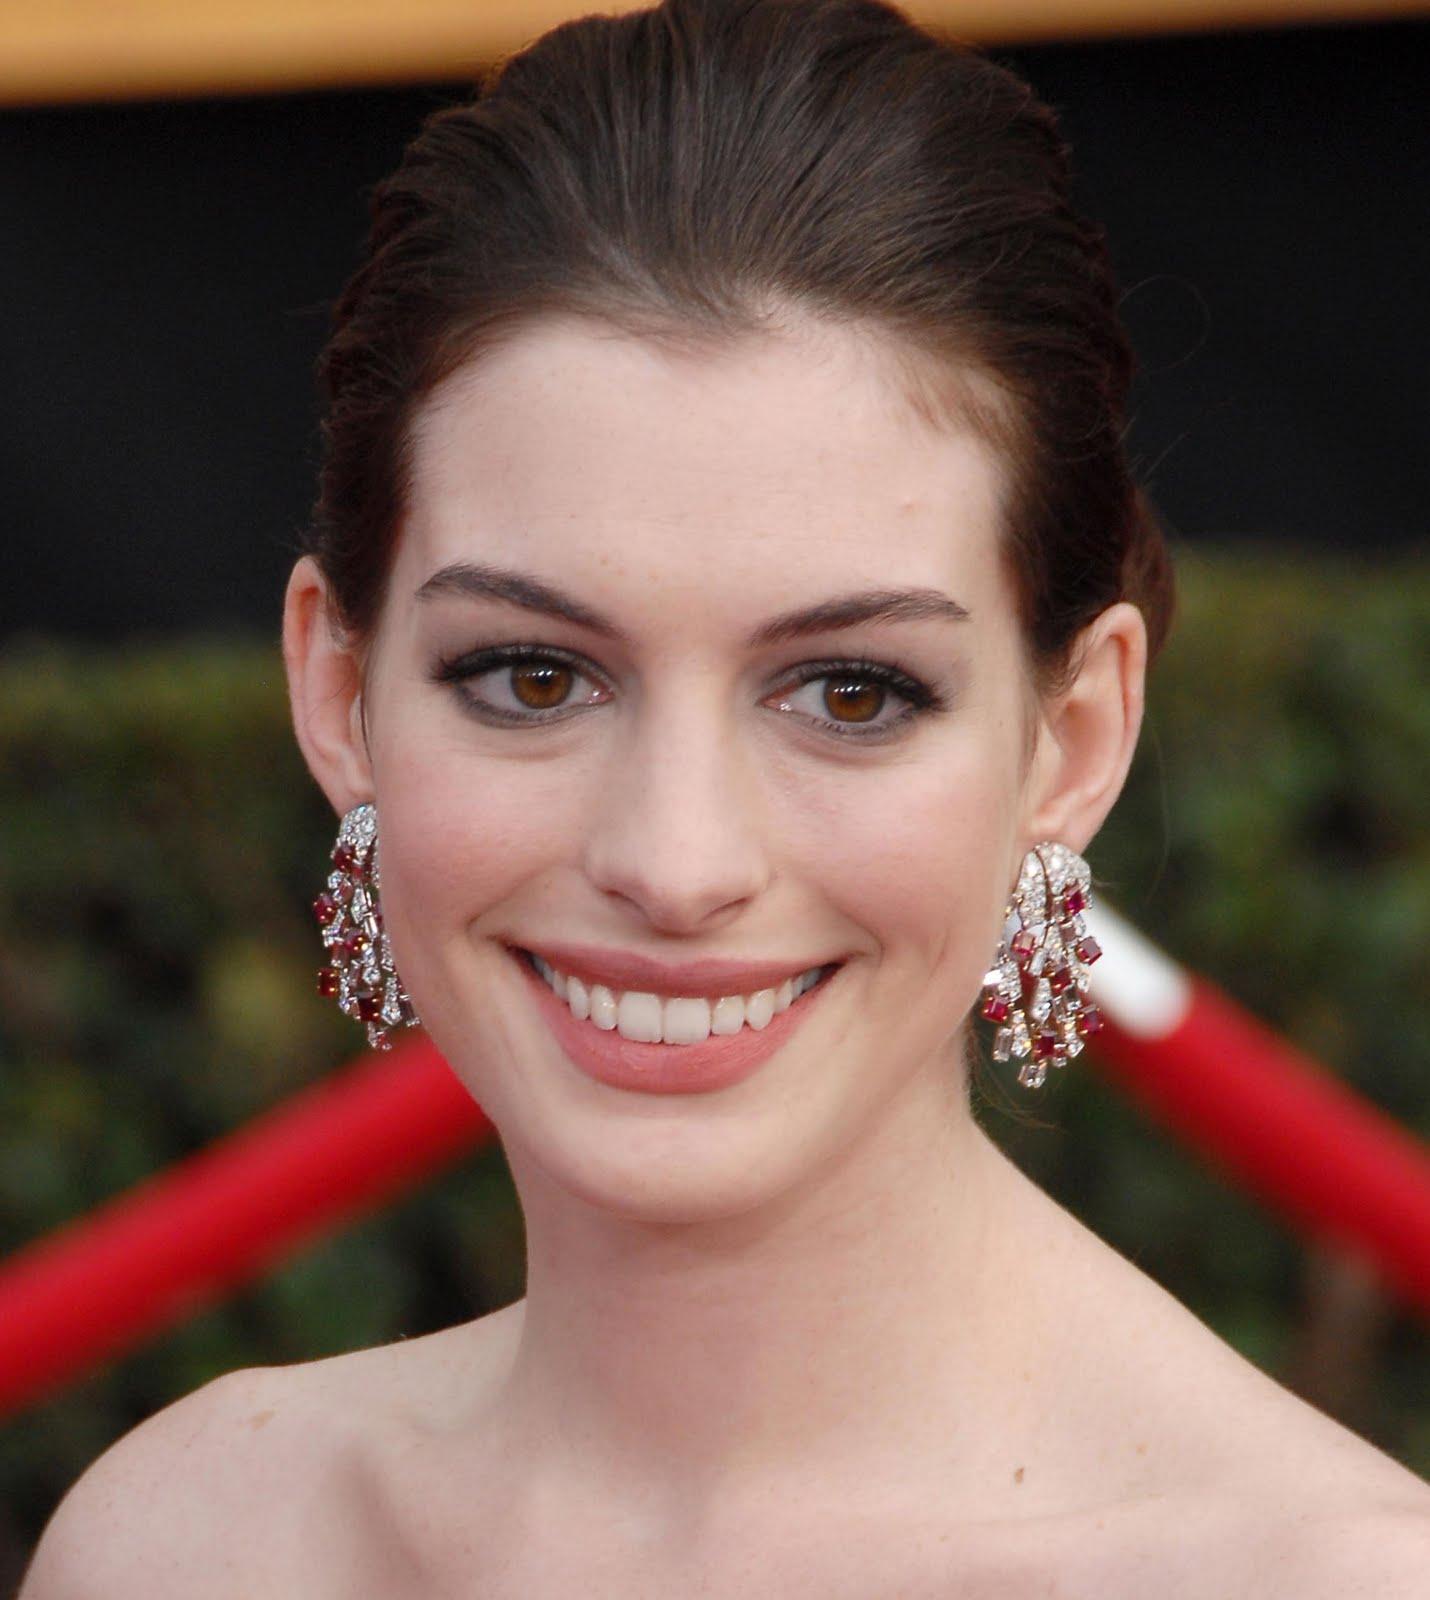 Anne Hathaway Gives A Stuntman A Black Eye!